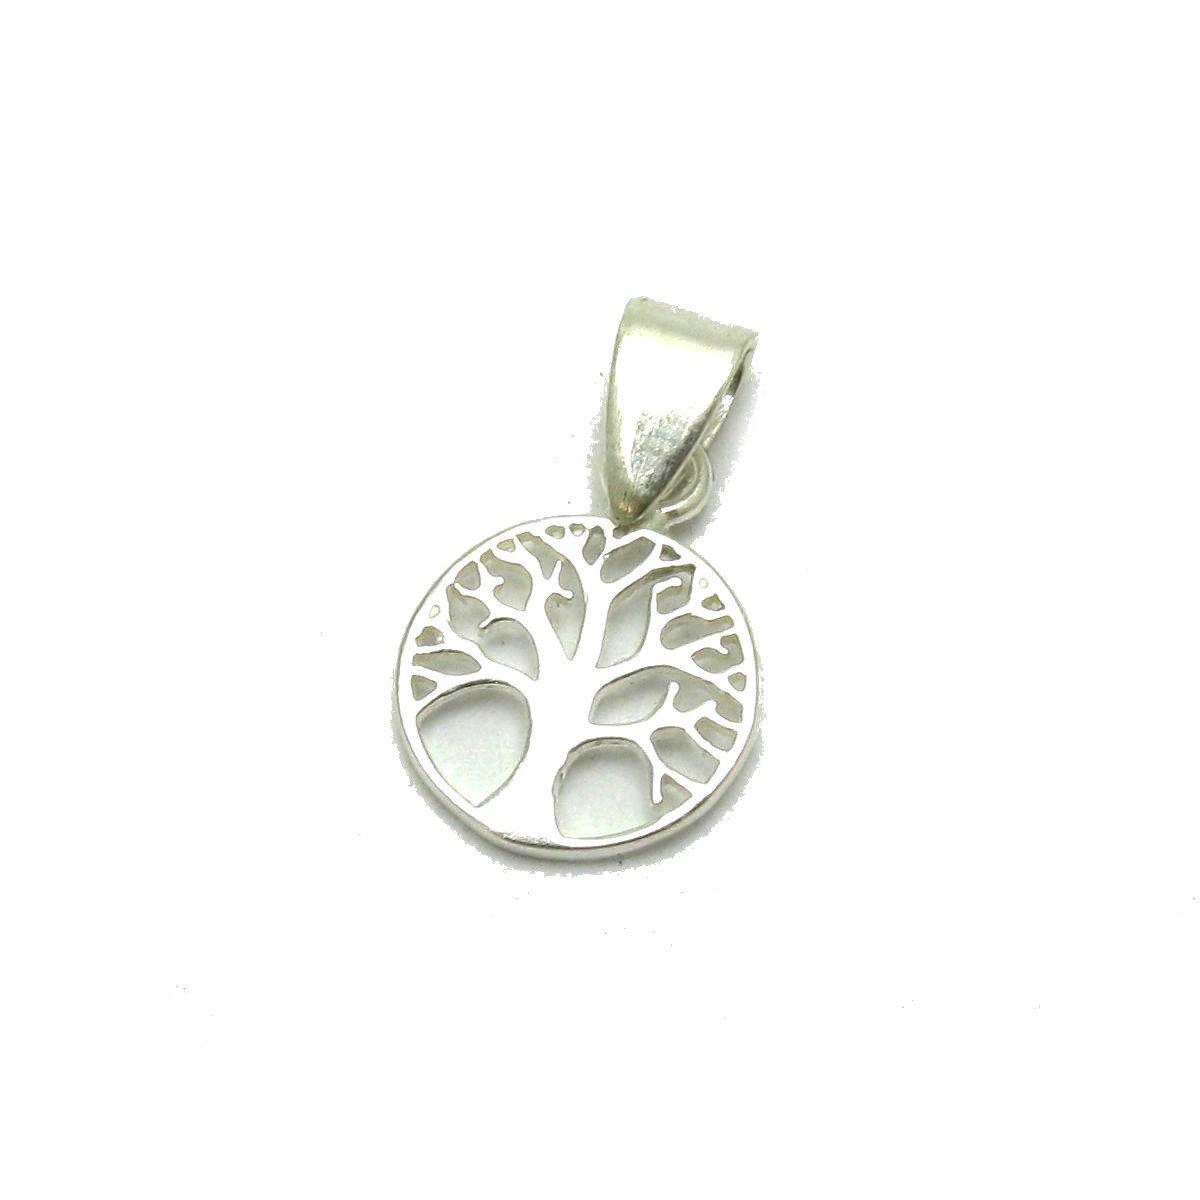 Silber Anhä nger 925 Baum des Lebens PE001208